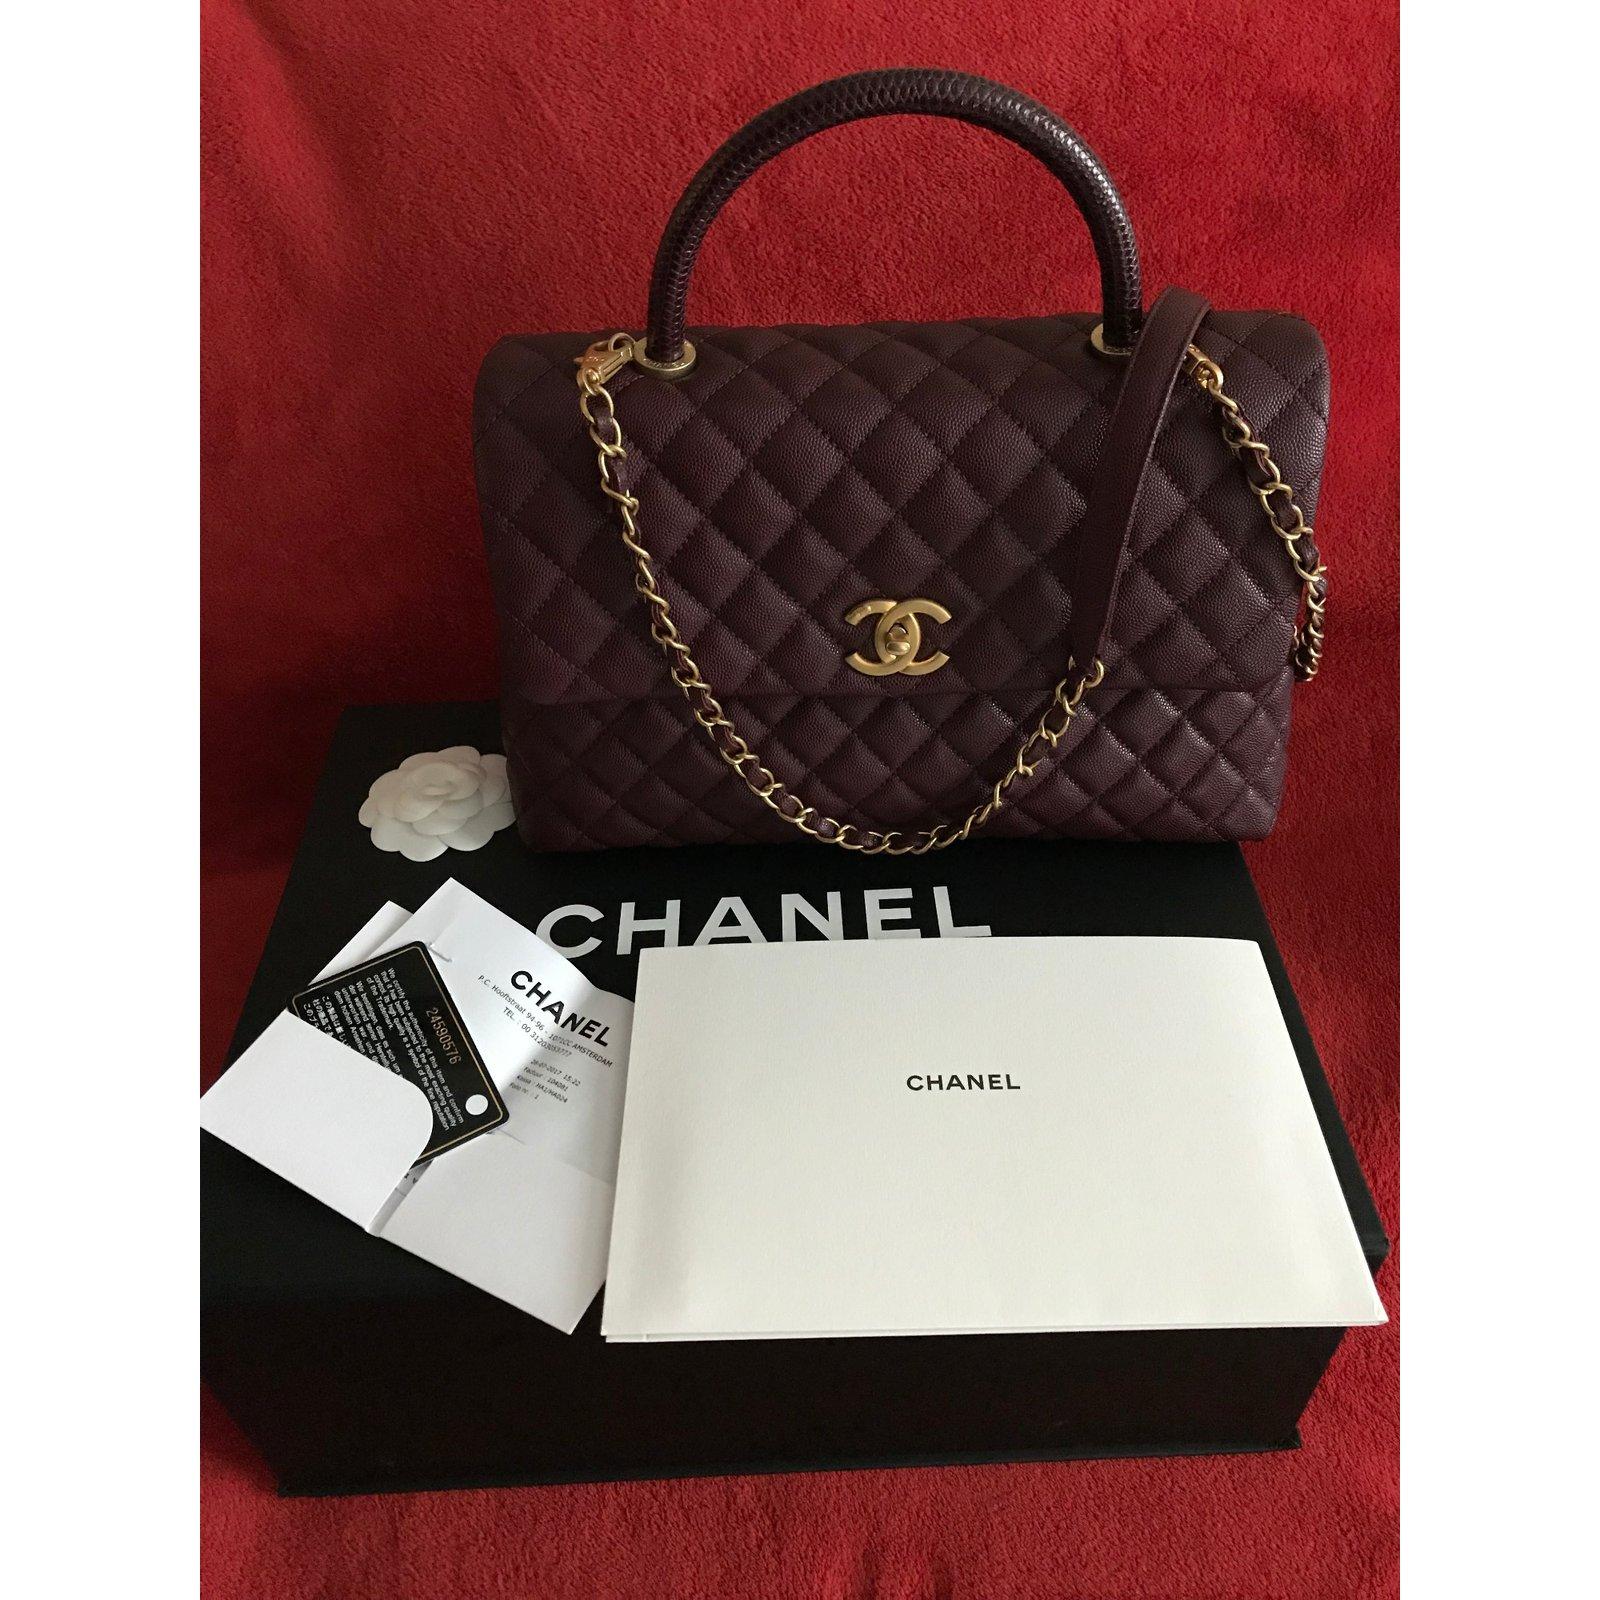 594947229e36 Chanel CHANEL Coco Handle Medium Bag Burgundy Caviar   Lizard   GOLD - New  Handbags Exotic leather Dark red ref.58069 - Joli Closet